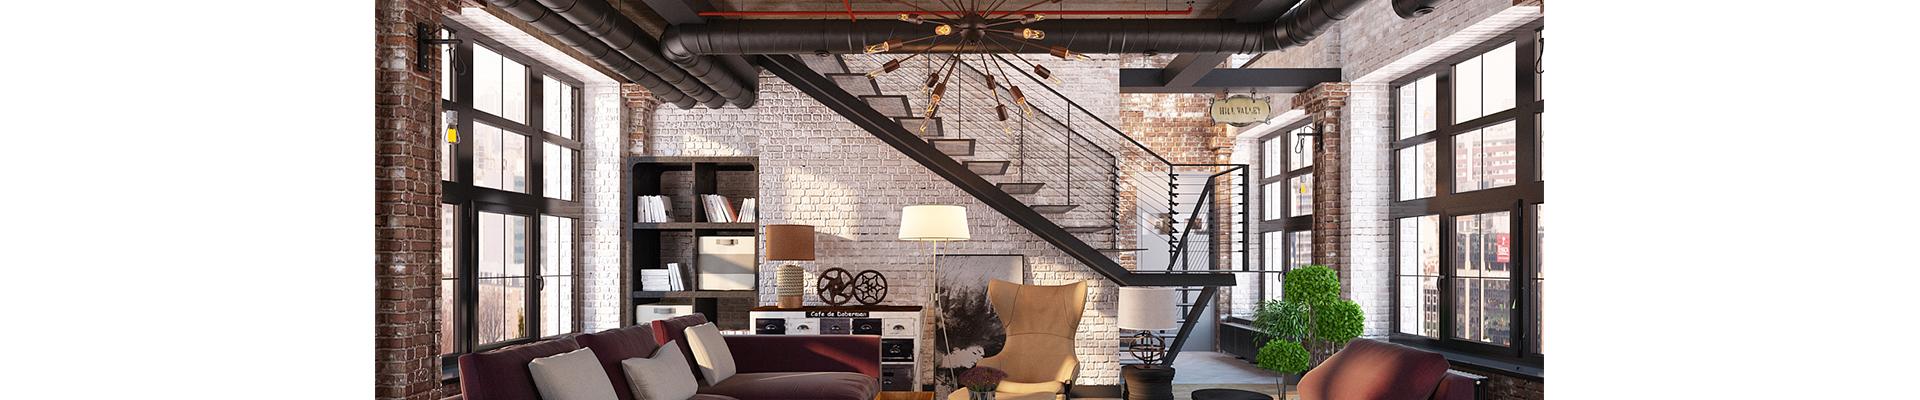 Kinmade-industrial-loft-look